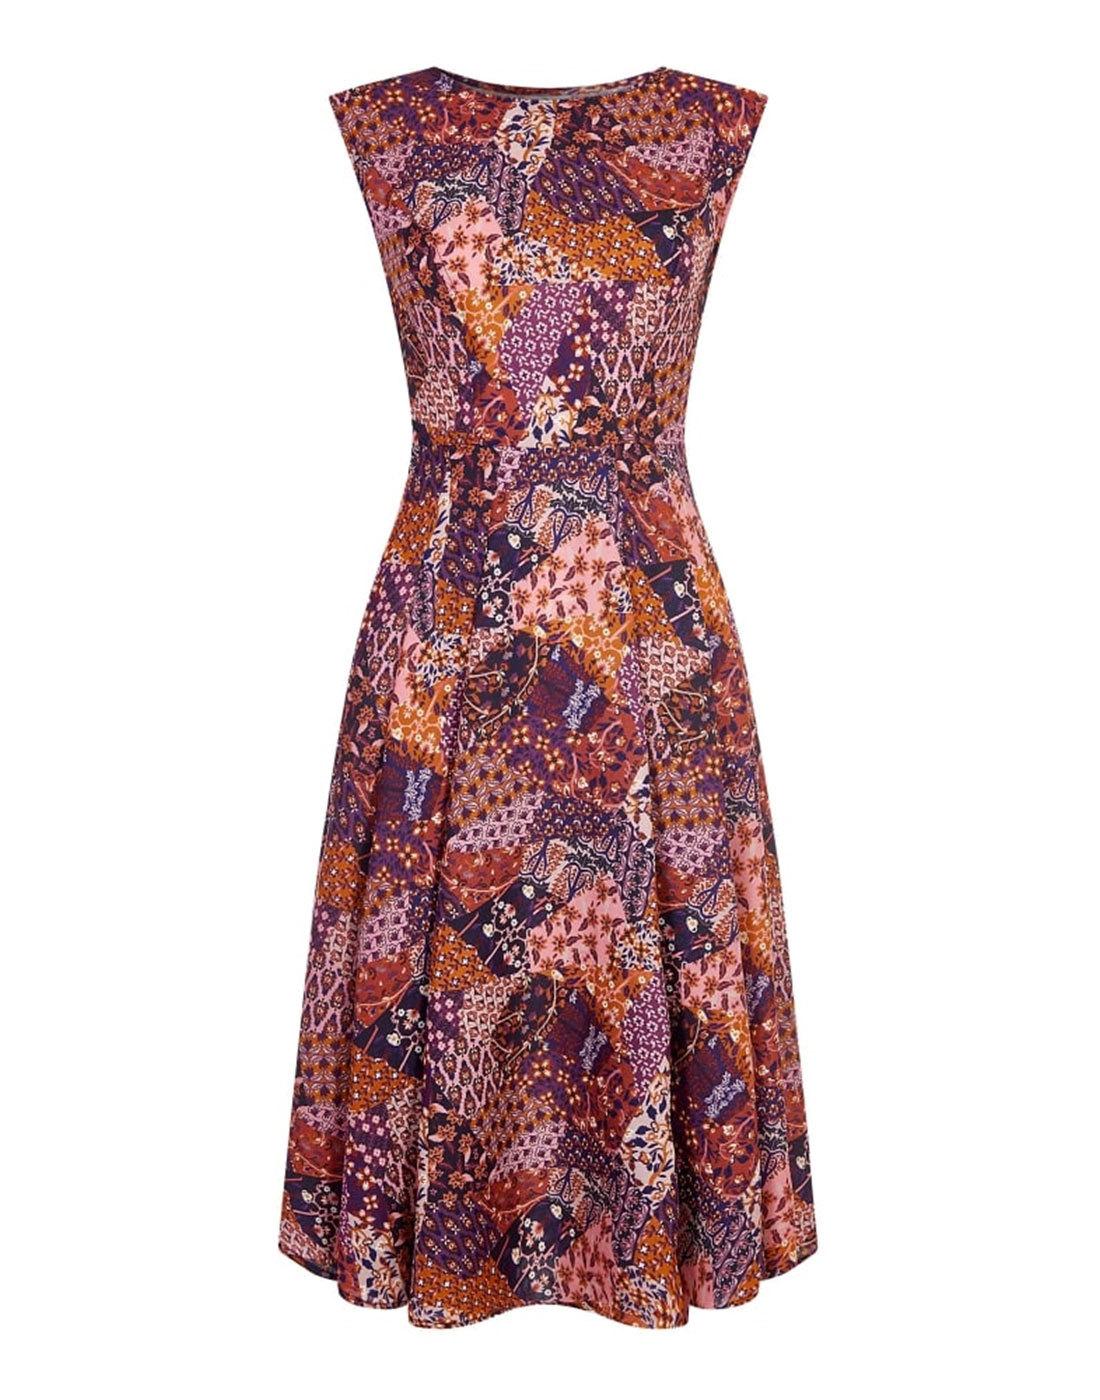 Astrid BRIGHT & BEAUTIFUL Retro 60s Summer Dress